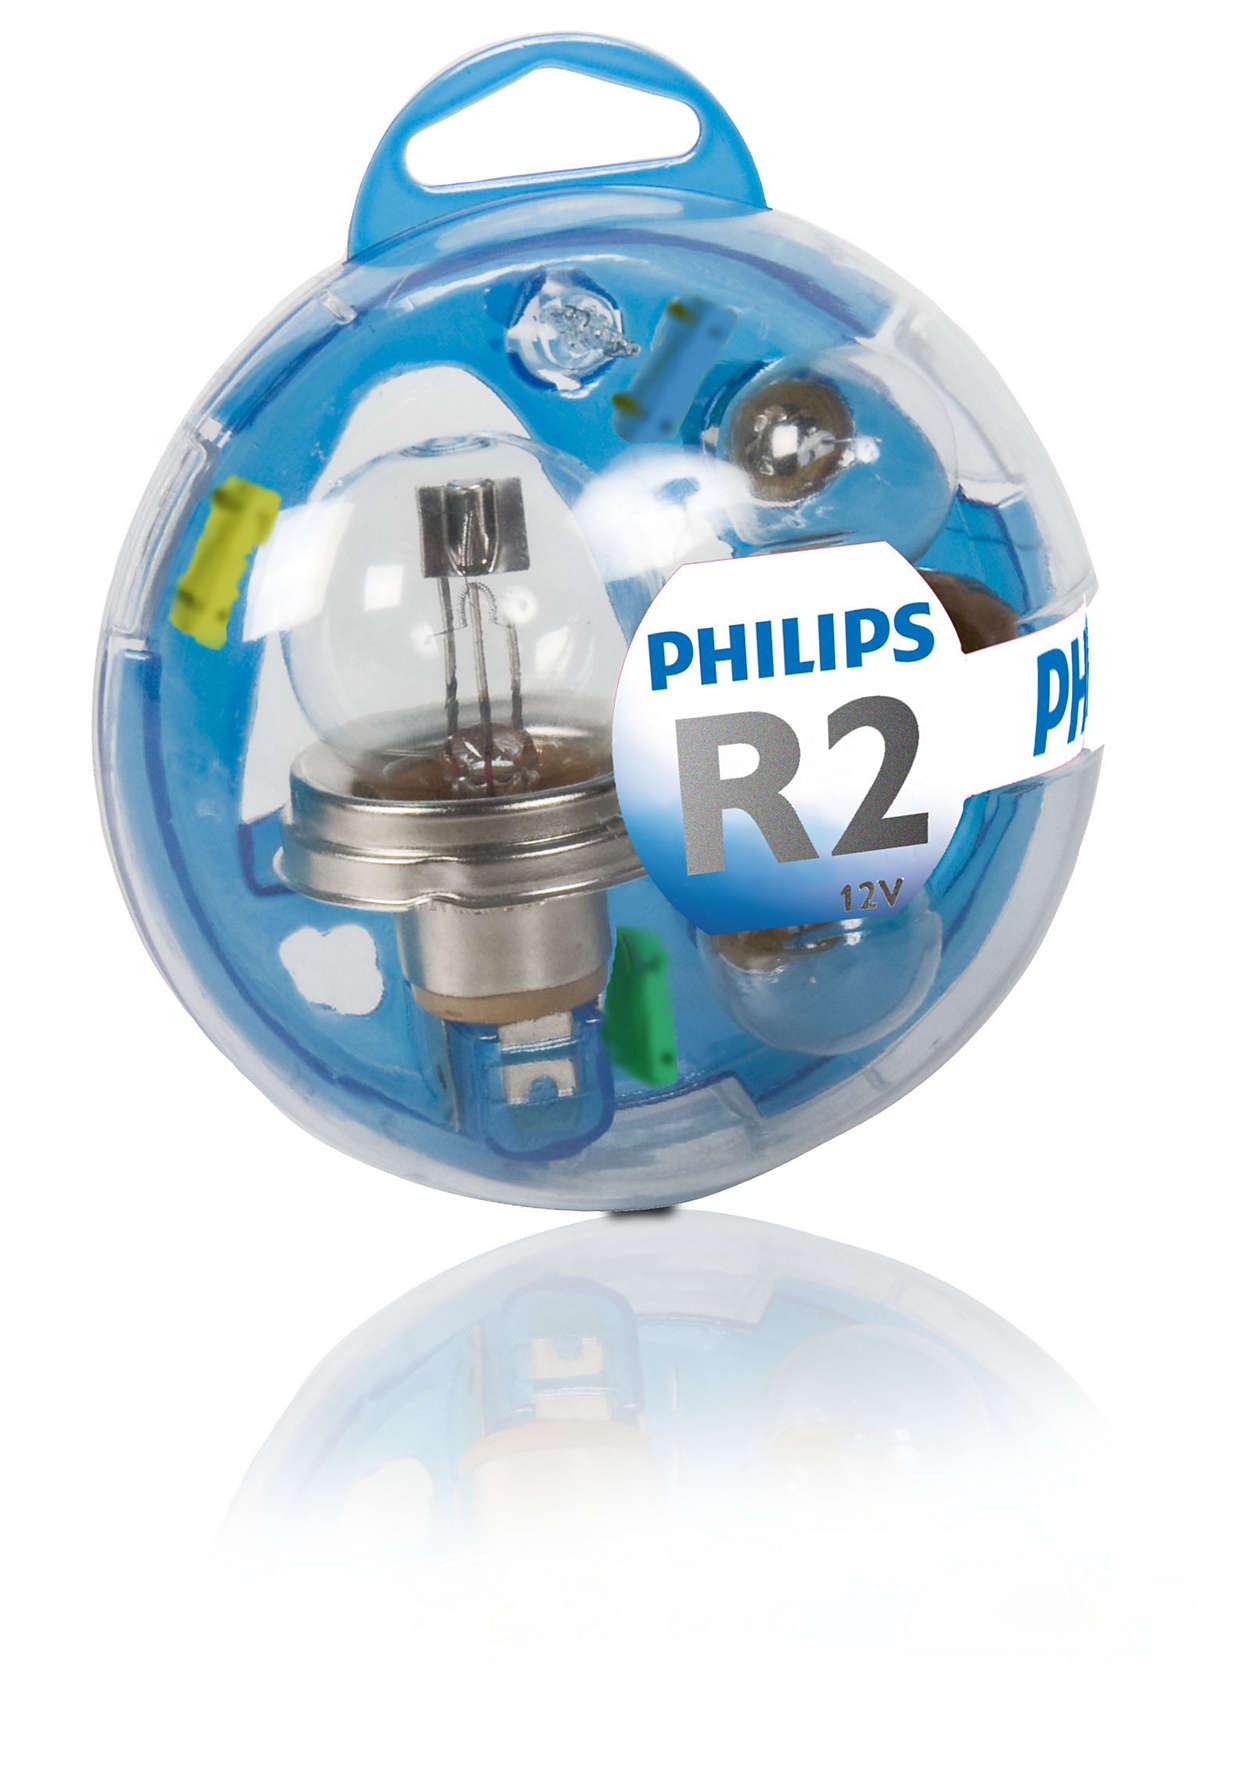 Todas as lâmpadas de que necessita num kit